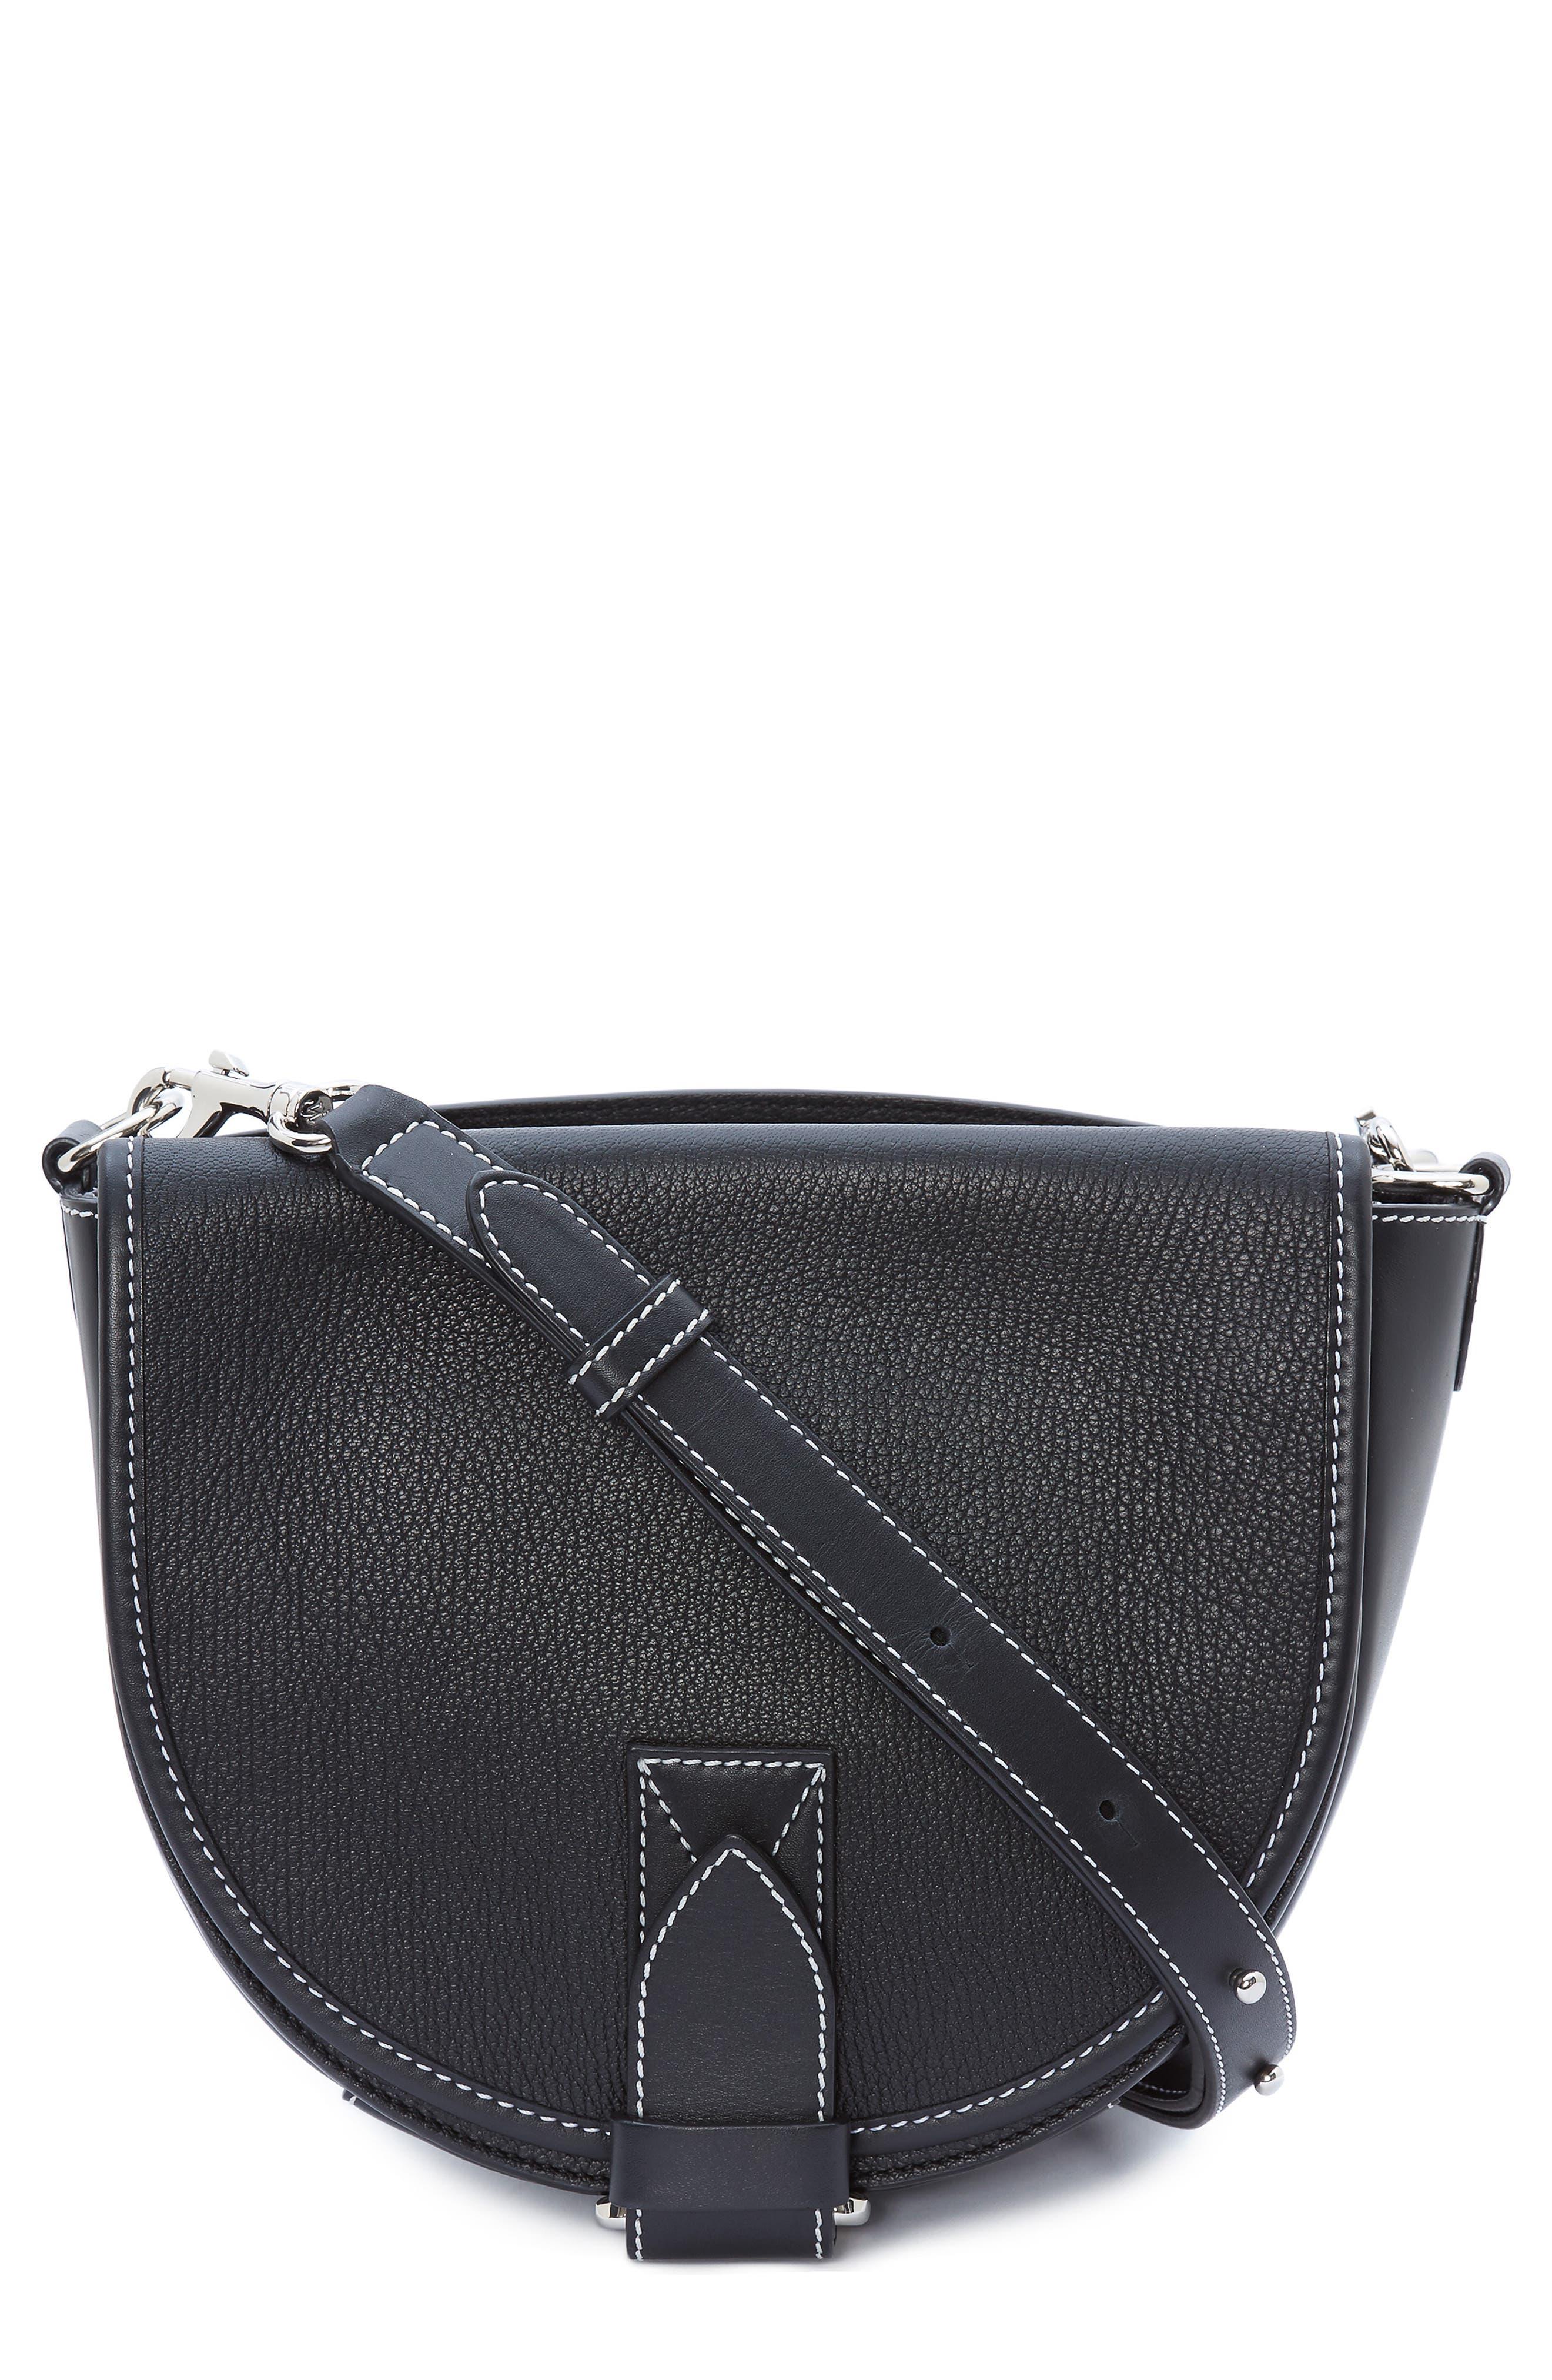 JW ANDERSON Small Bike Leather Crossbody Bag, Main, color, BLACK